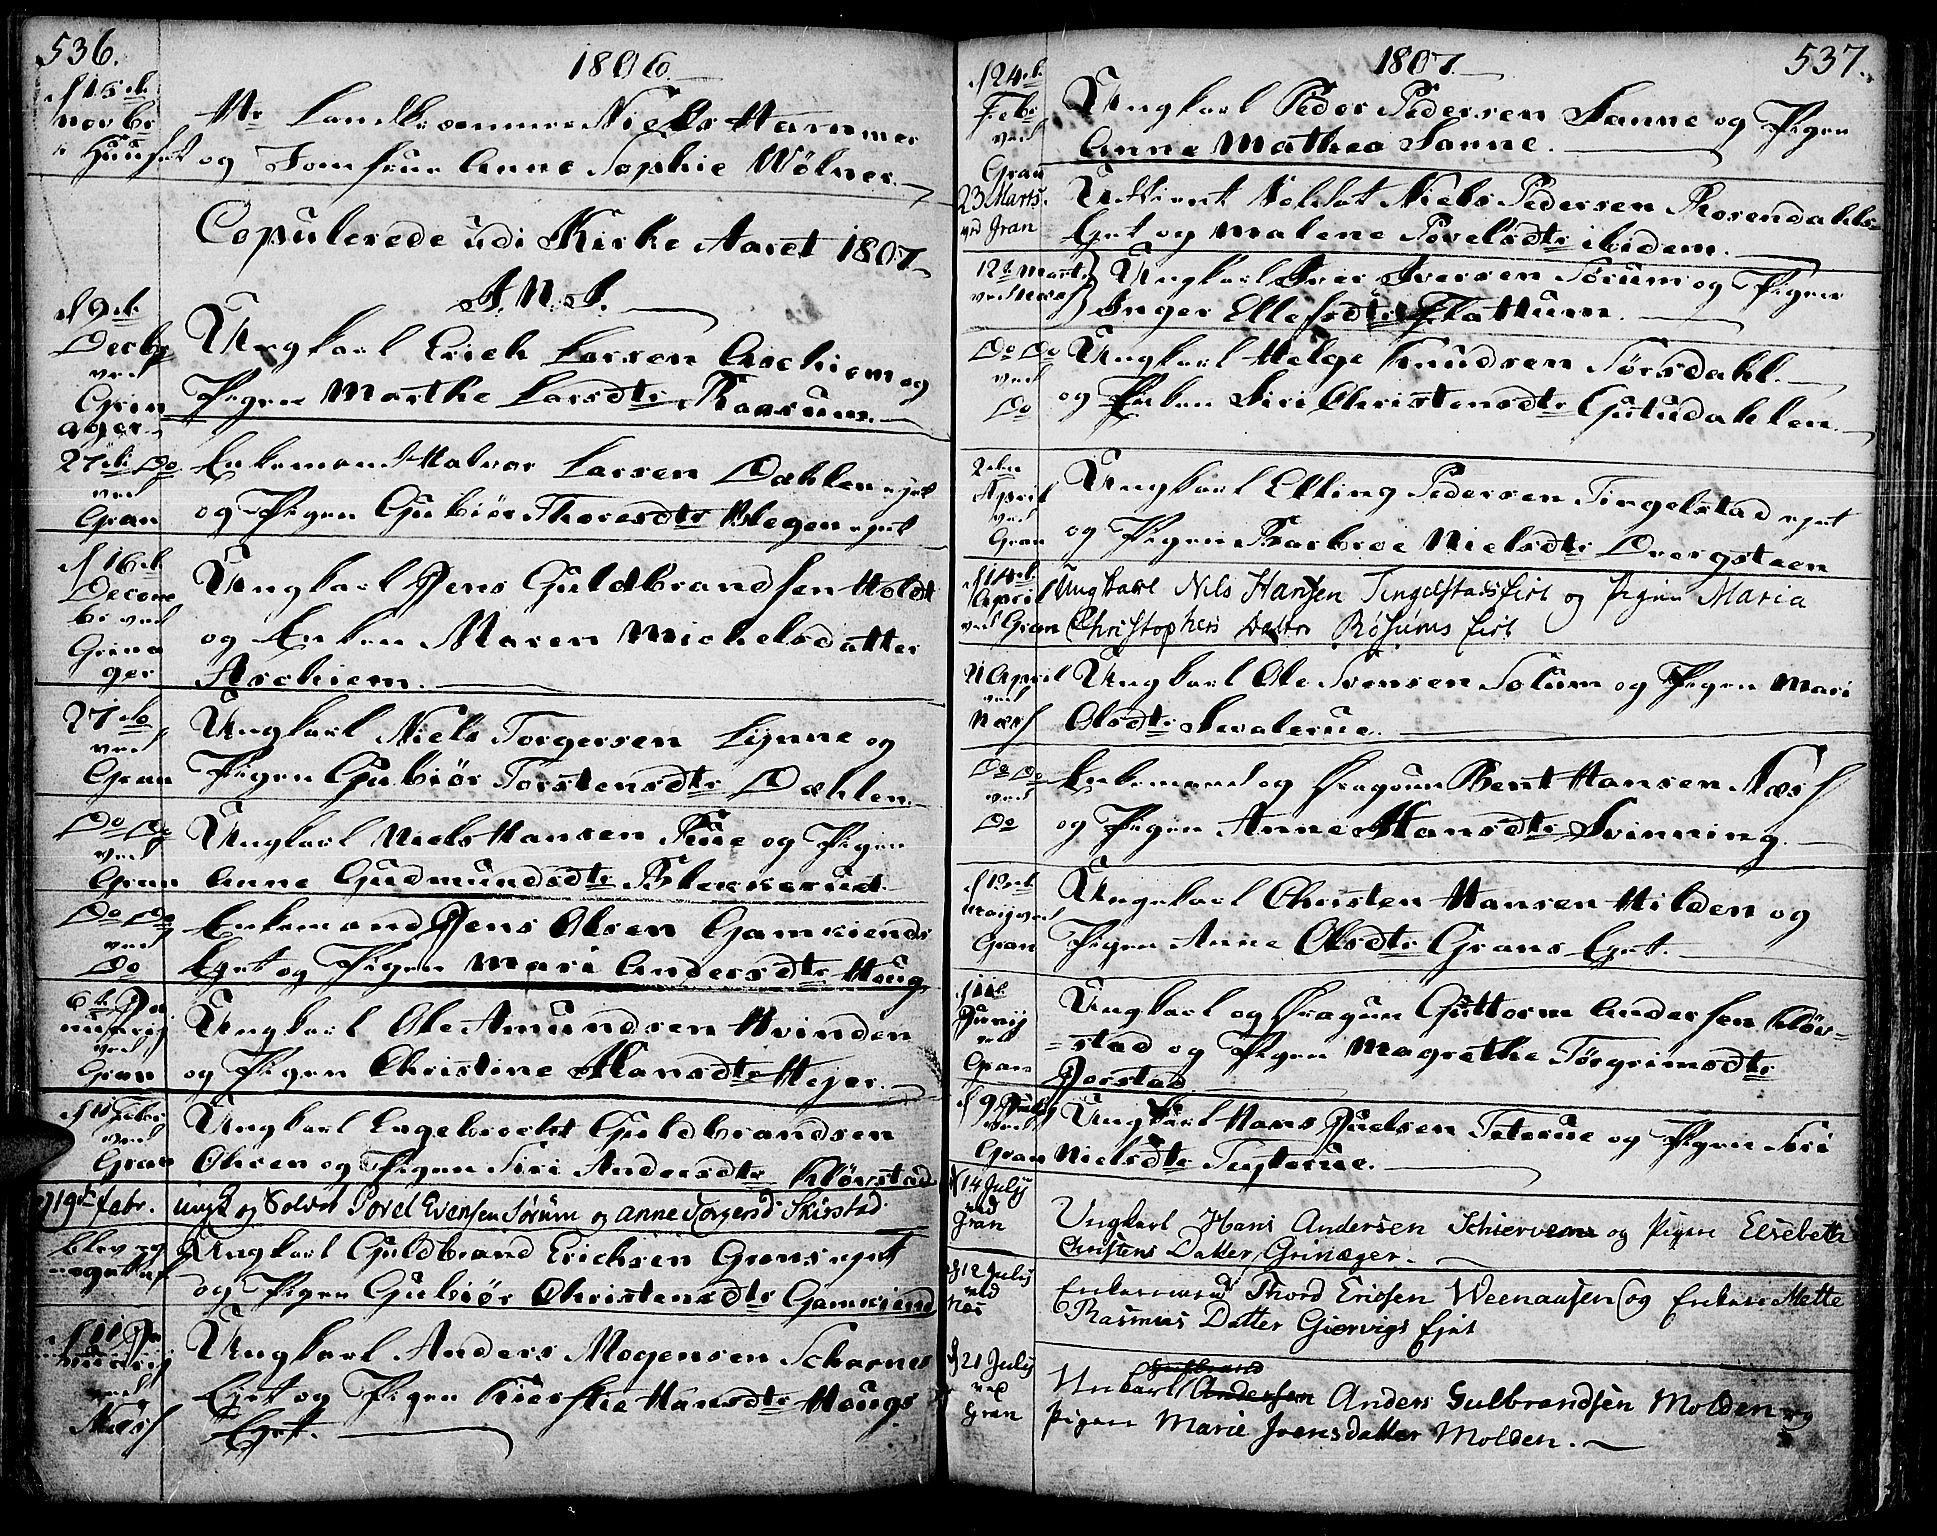 SAH, Gran prestekontor, Ministerialbok nr. 6, 1787-1824, s. 536-537